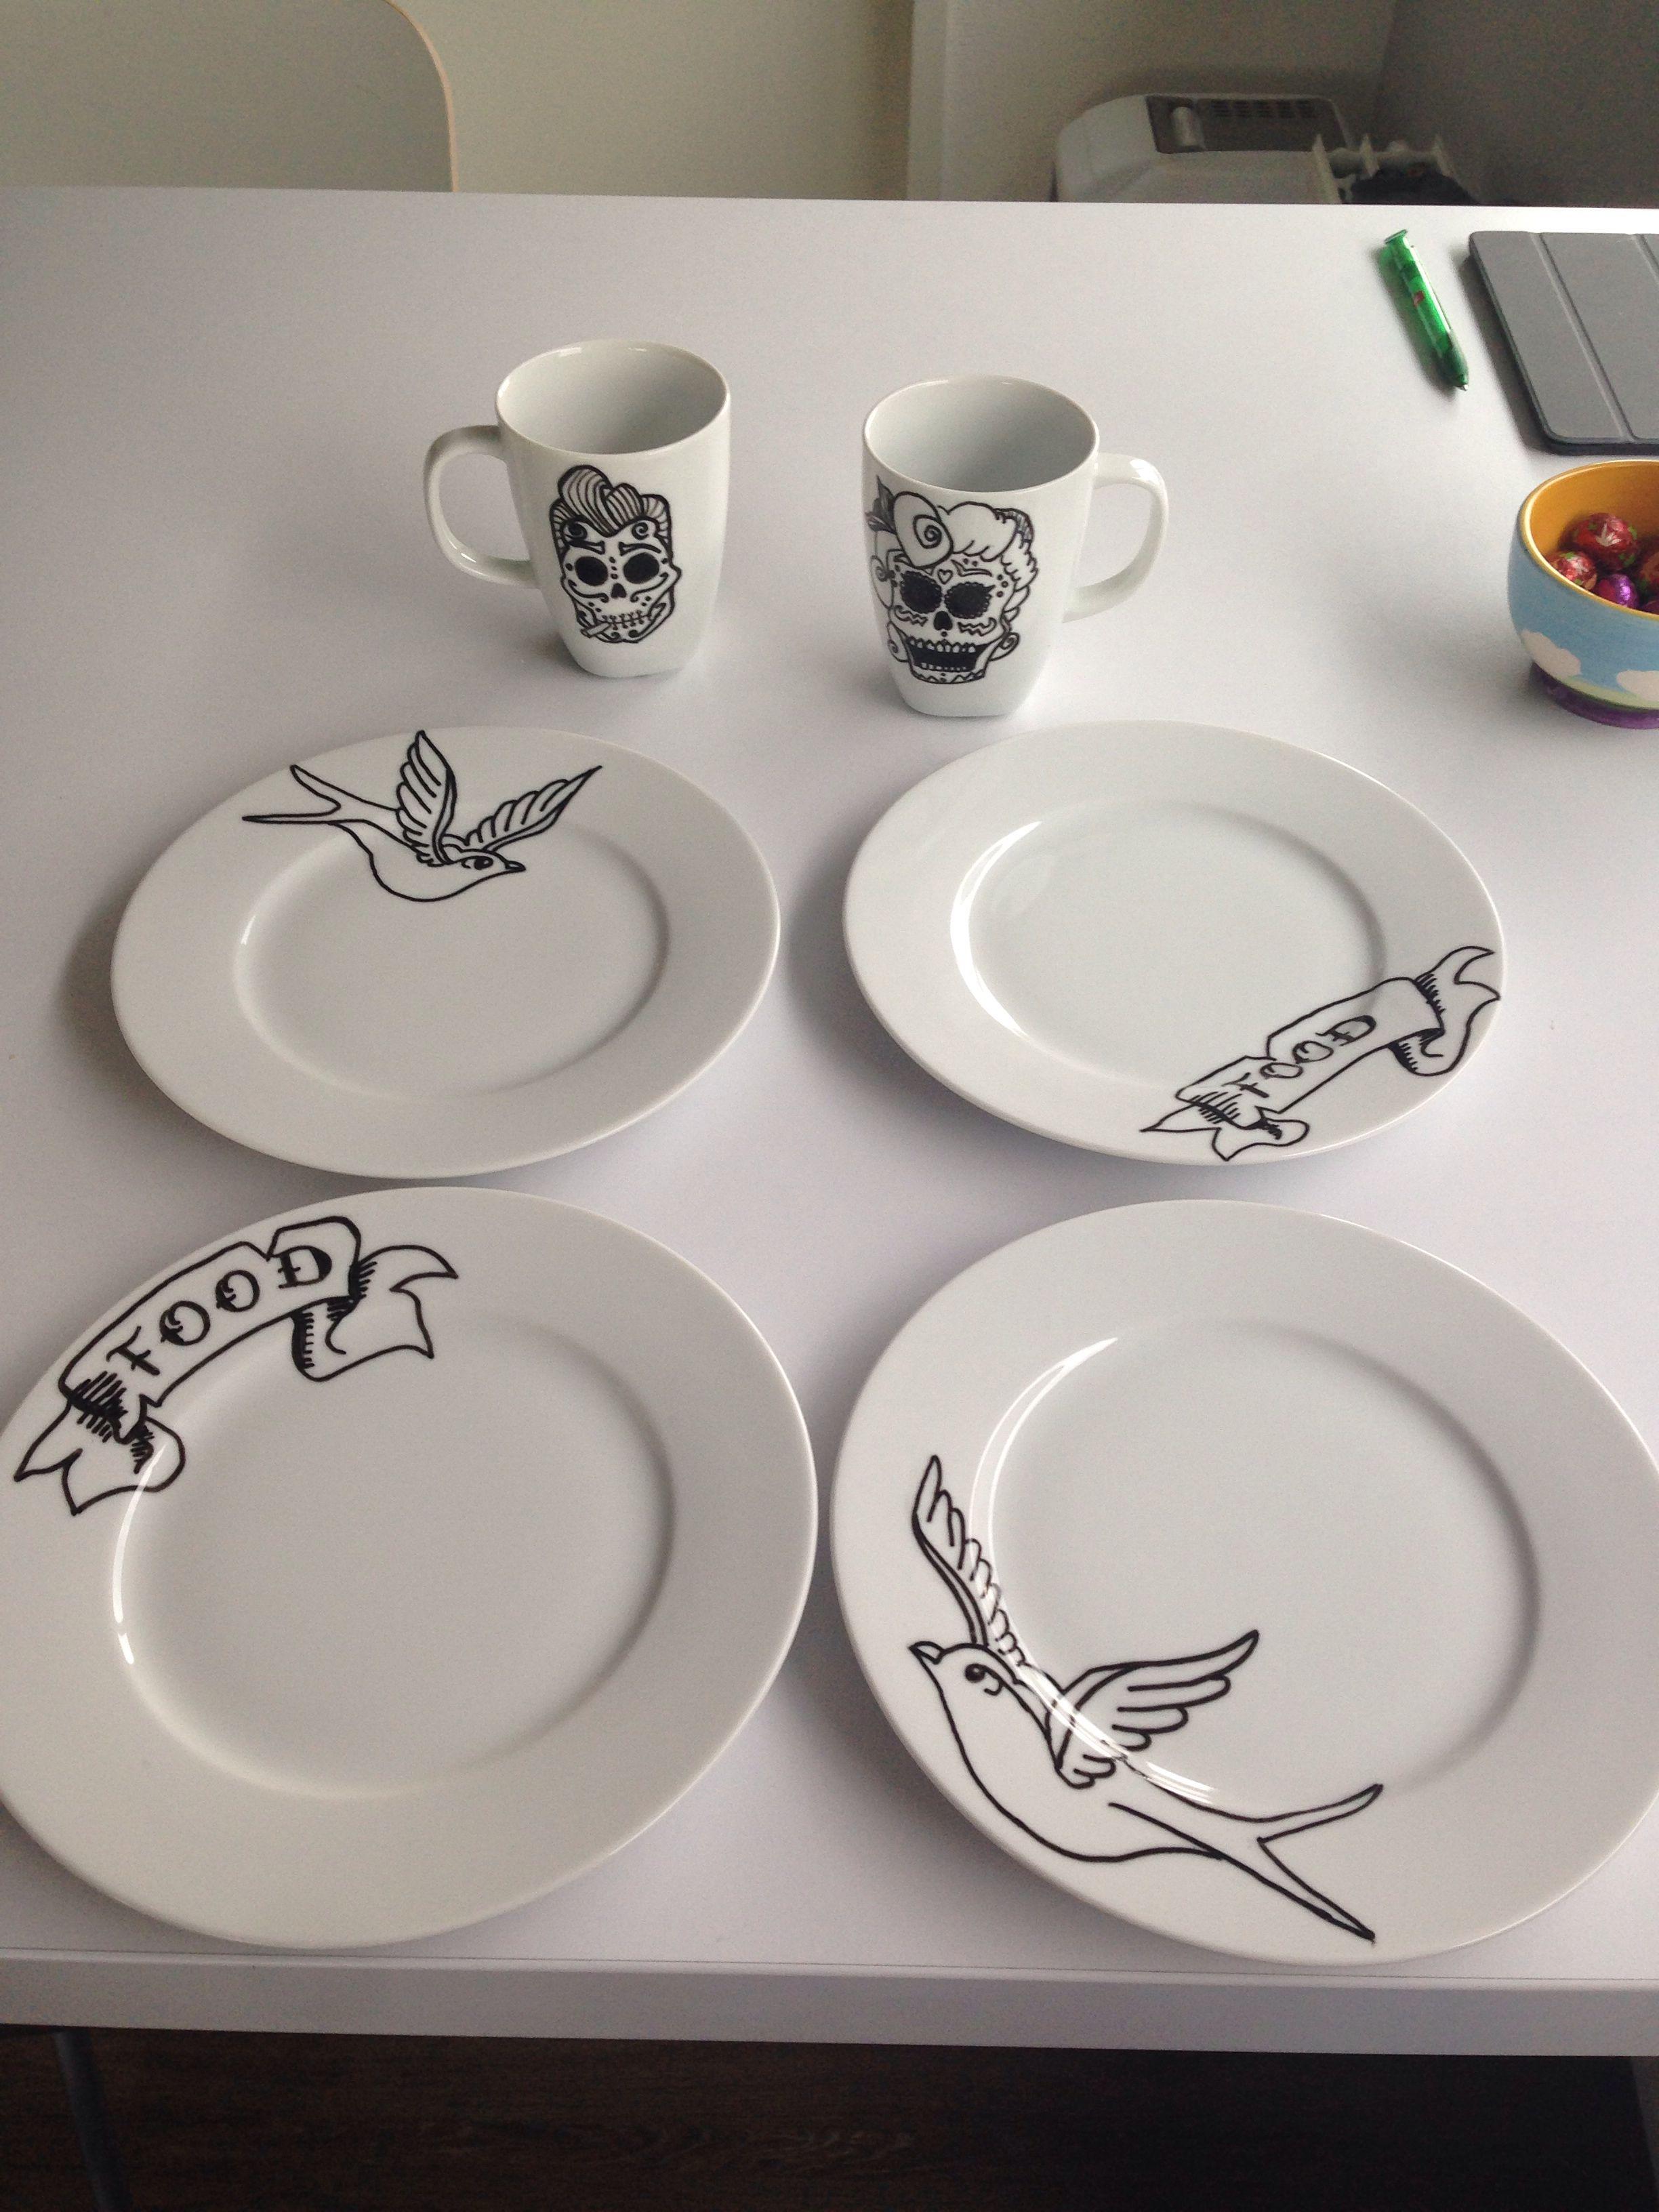 Porcelain-pen on ikea-plates. Let ink dry for 4hours. Put